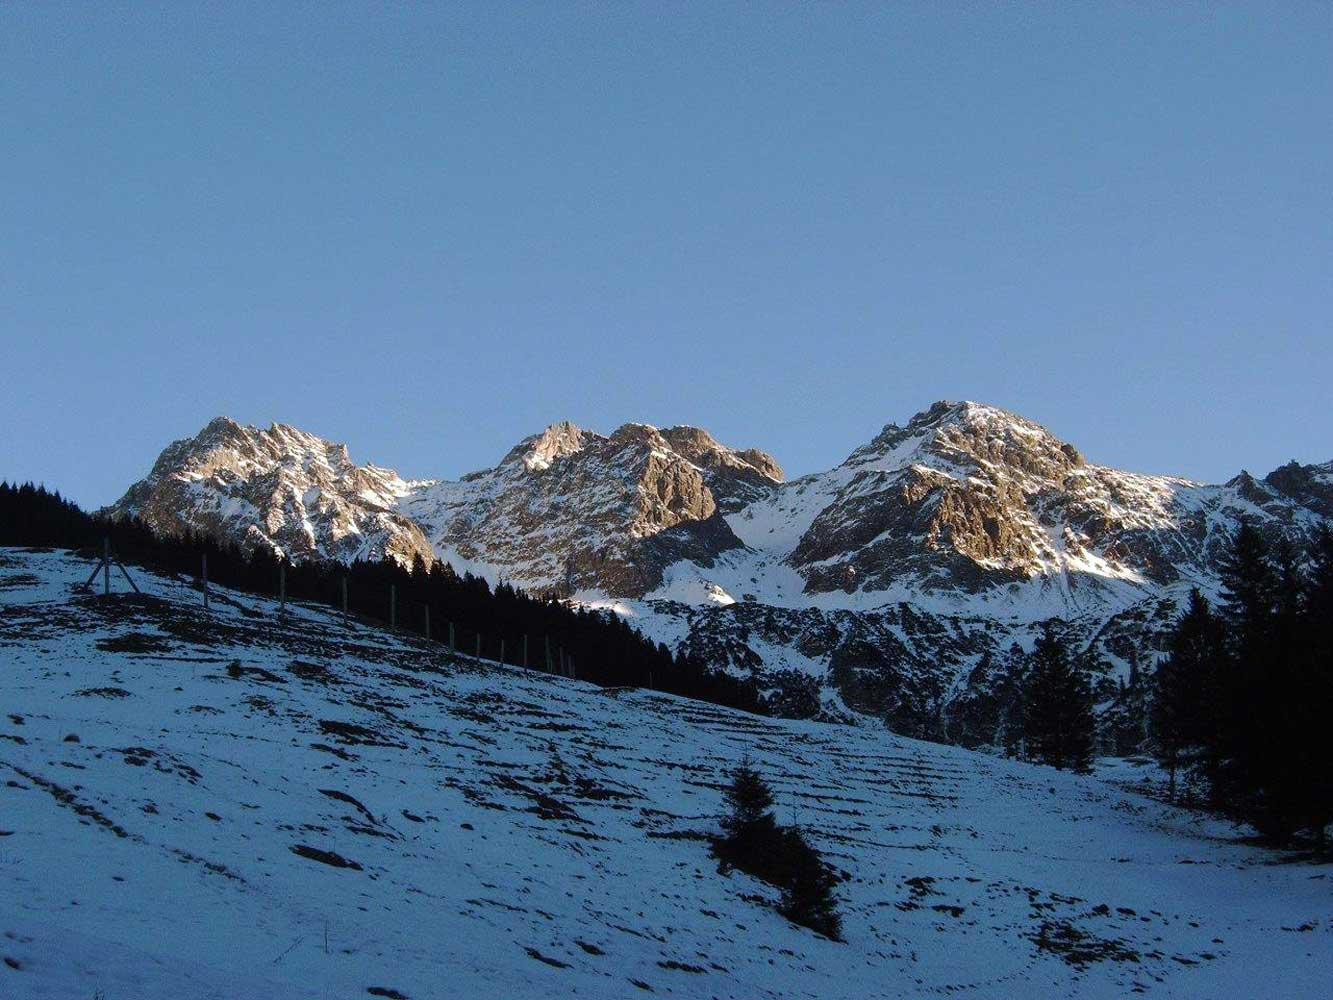 Innere Wiesalpe – tolle Bergsicht